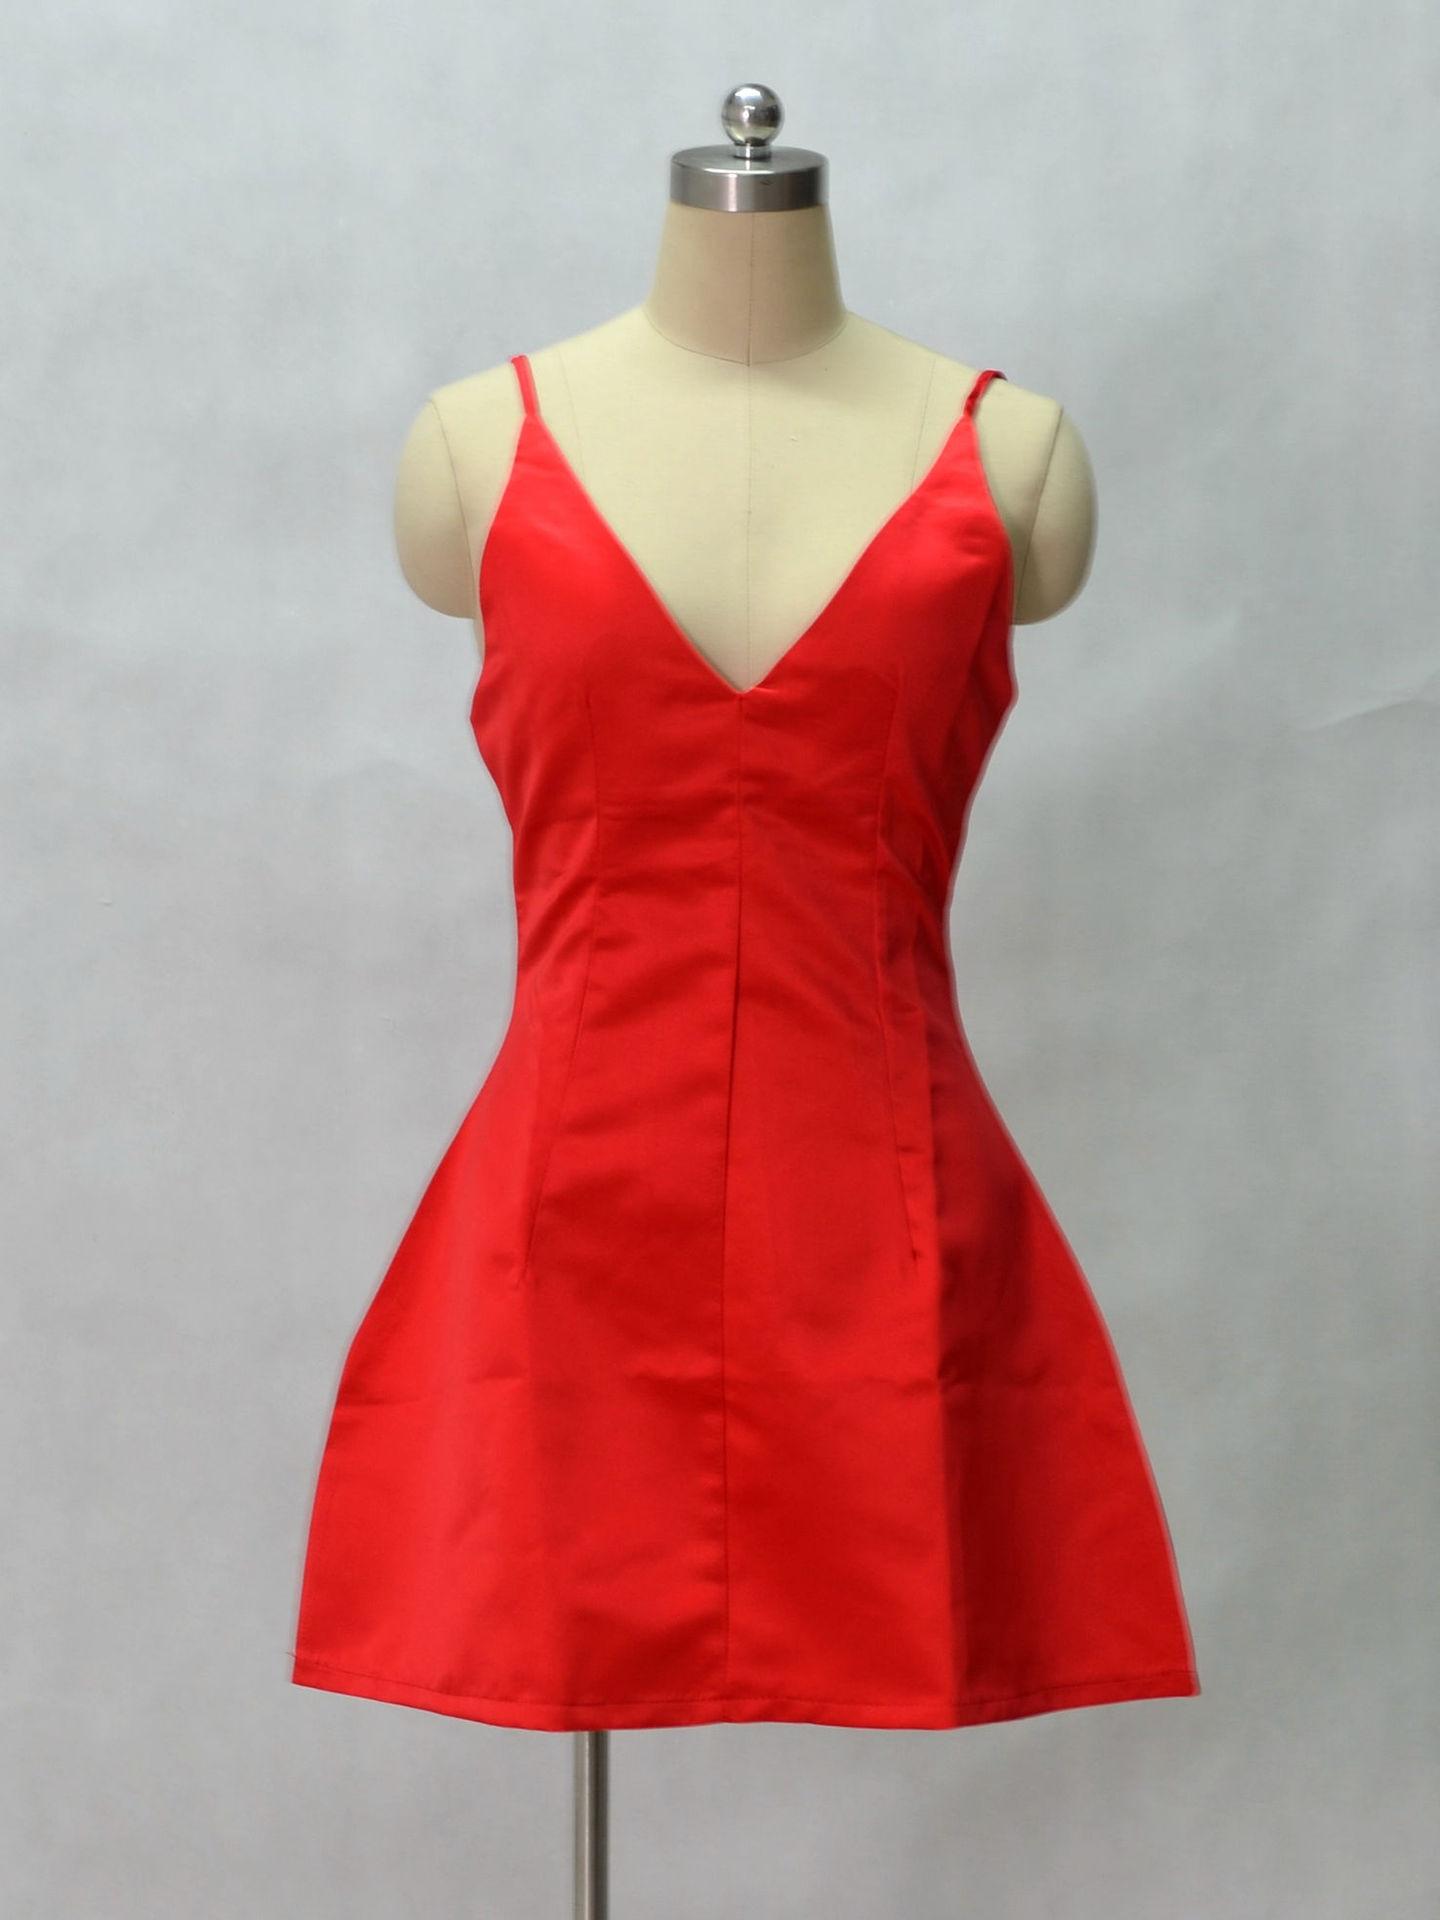 HTB1MlF2PpXXXXazXXXXq6xXFXXXo - FREE SHIPPING Red Dress Palace Retro V JKP187